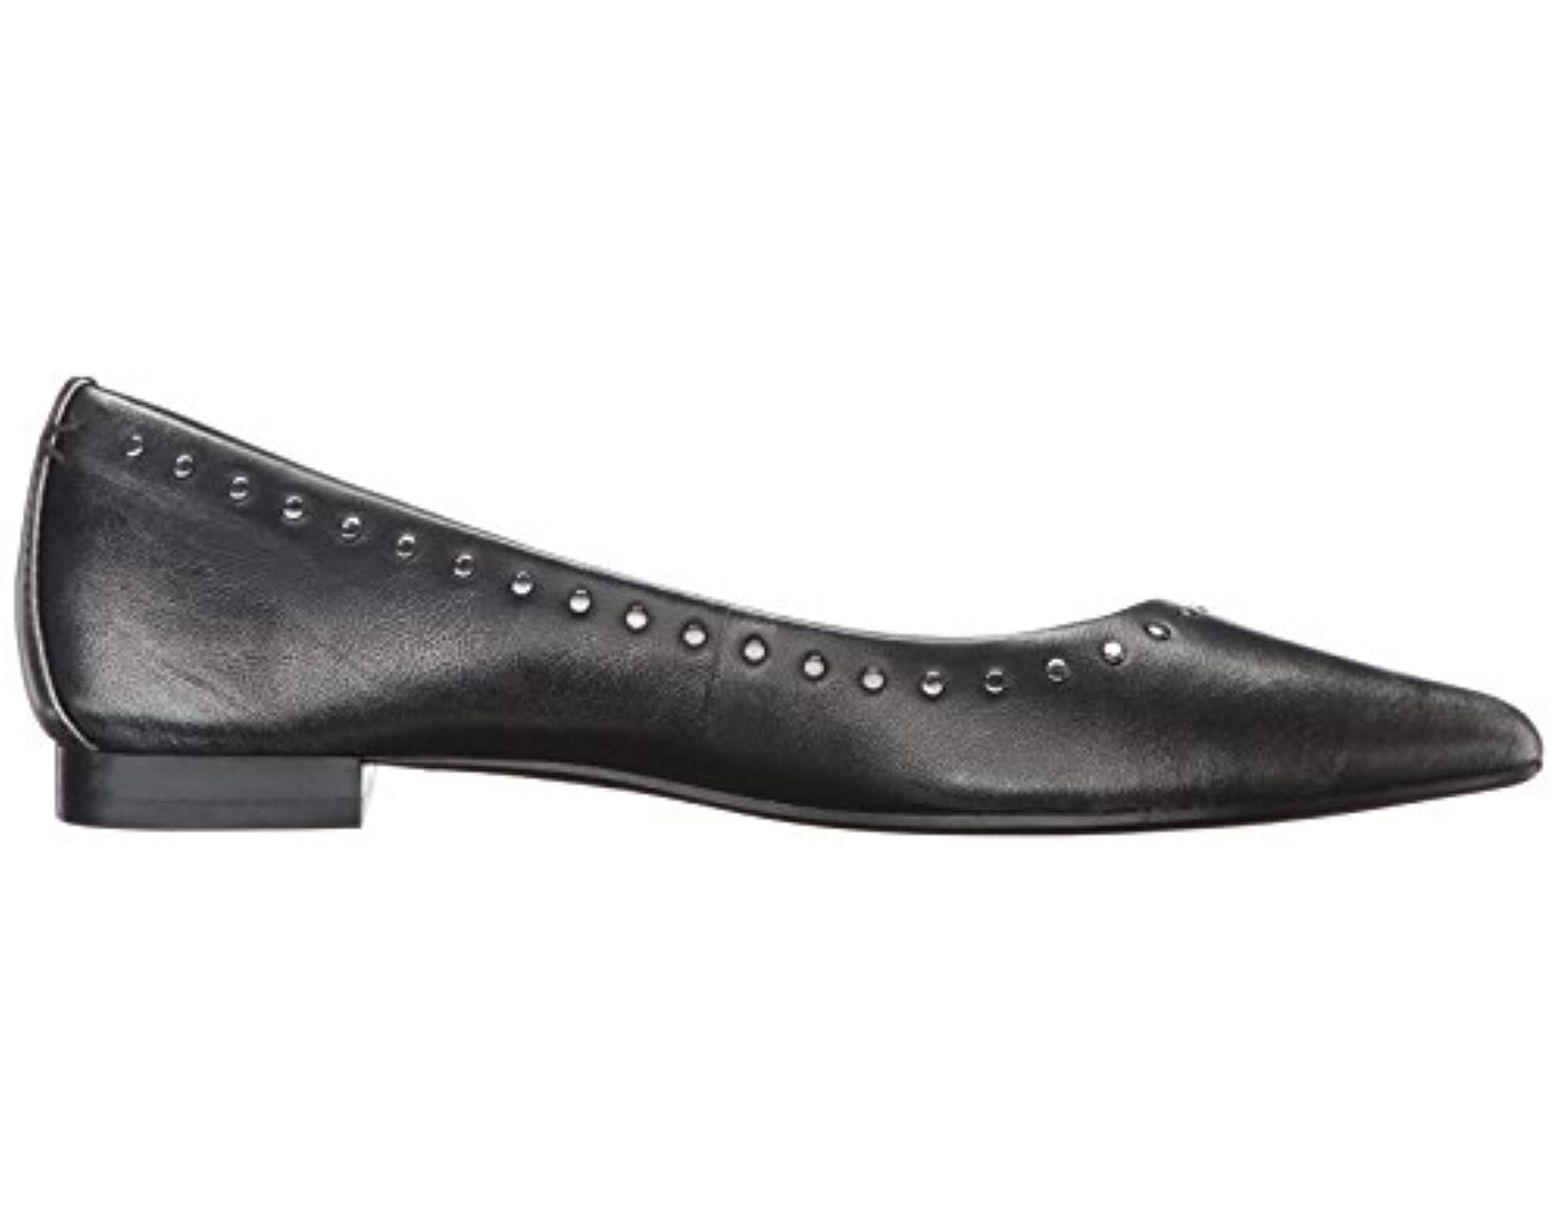 938ba3f18f716 Women's Sienna Micro Stud Ballet Flat